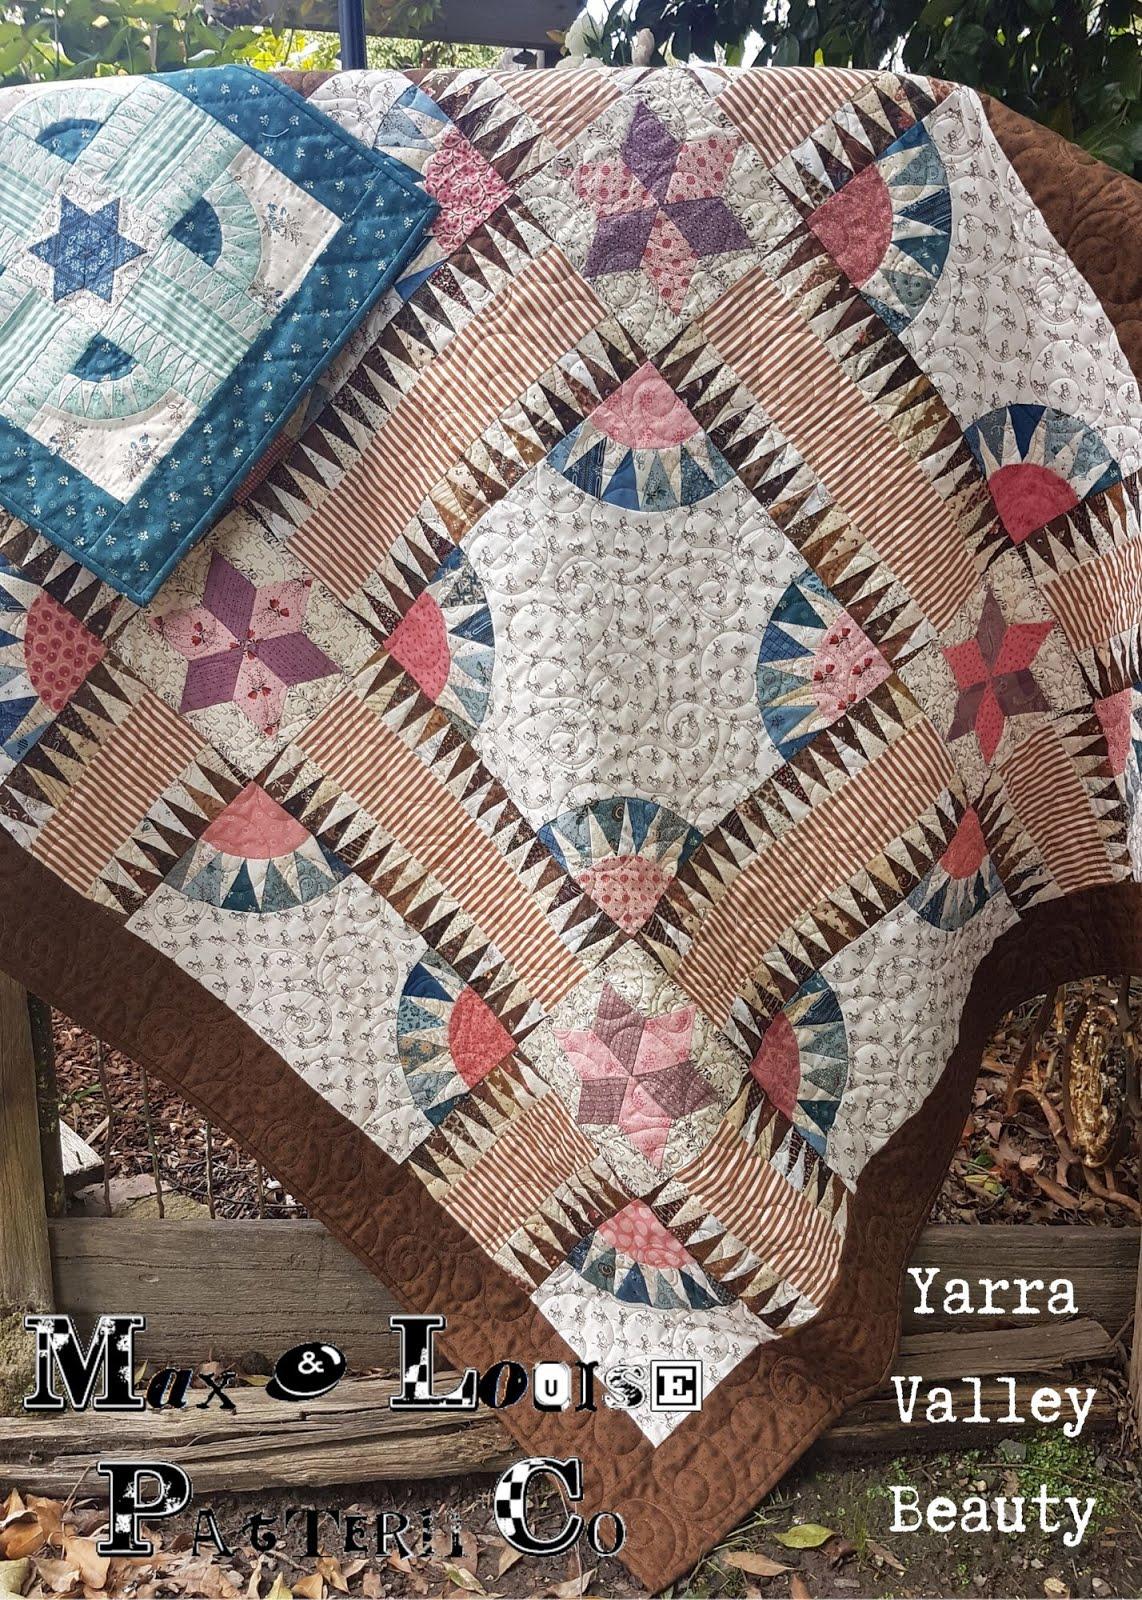 YARRA VALLEY BEAUTY